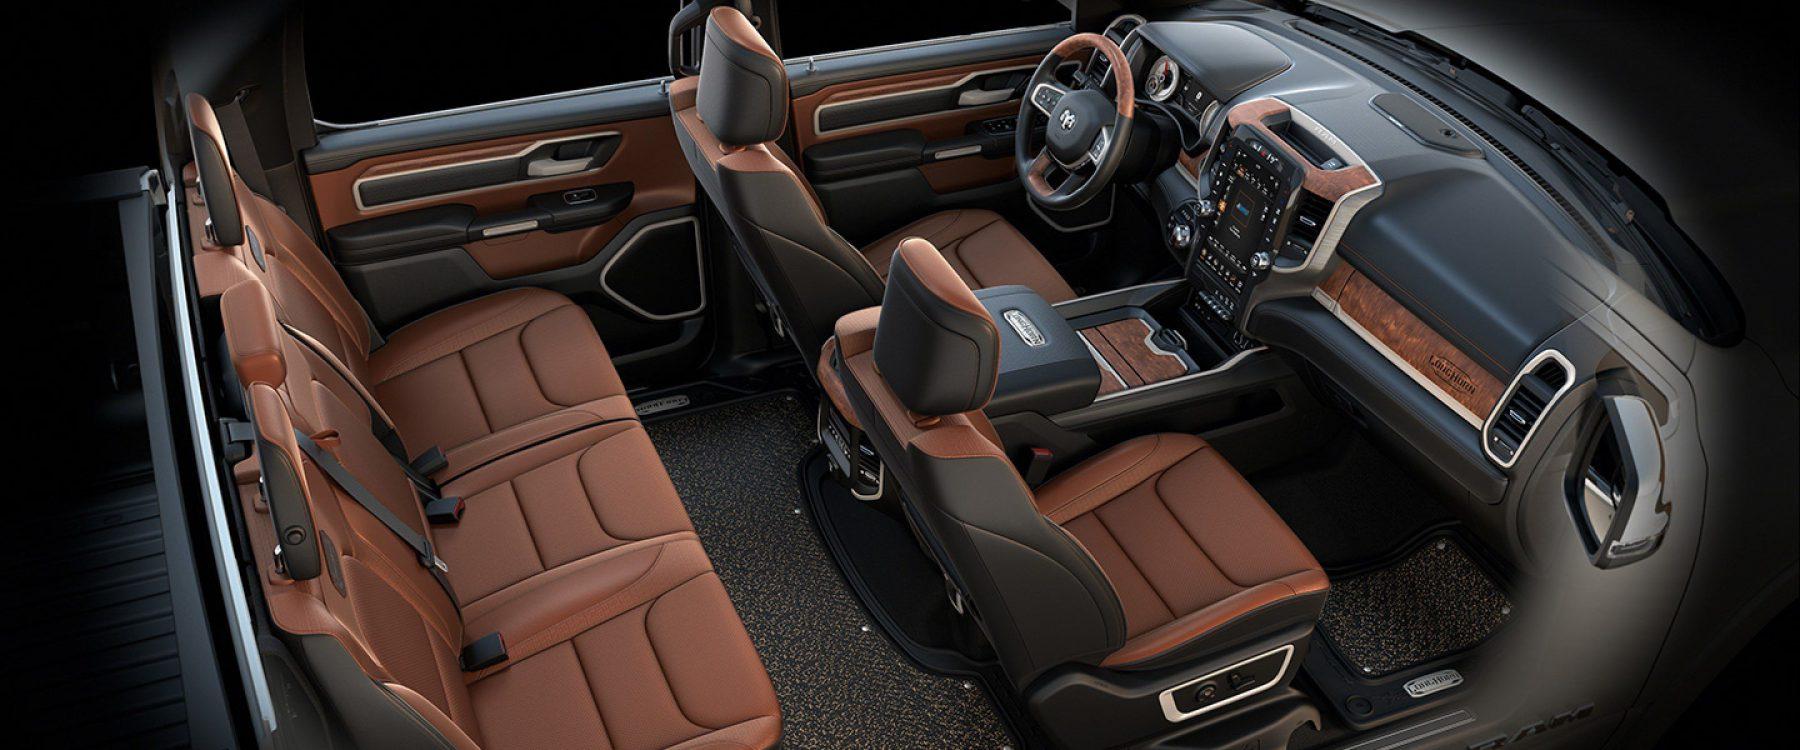 2019 Ram 1500 Interior Seats Longhorn black cattle tan